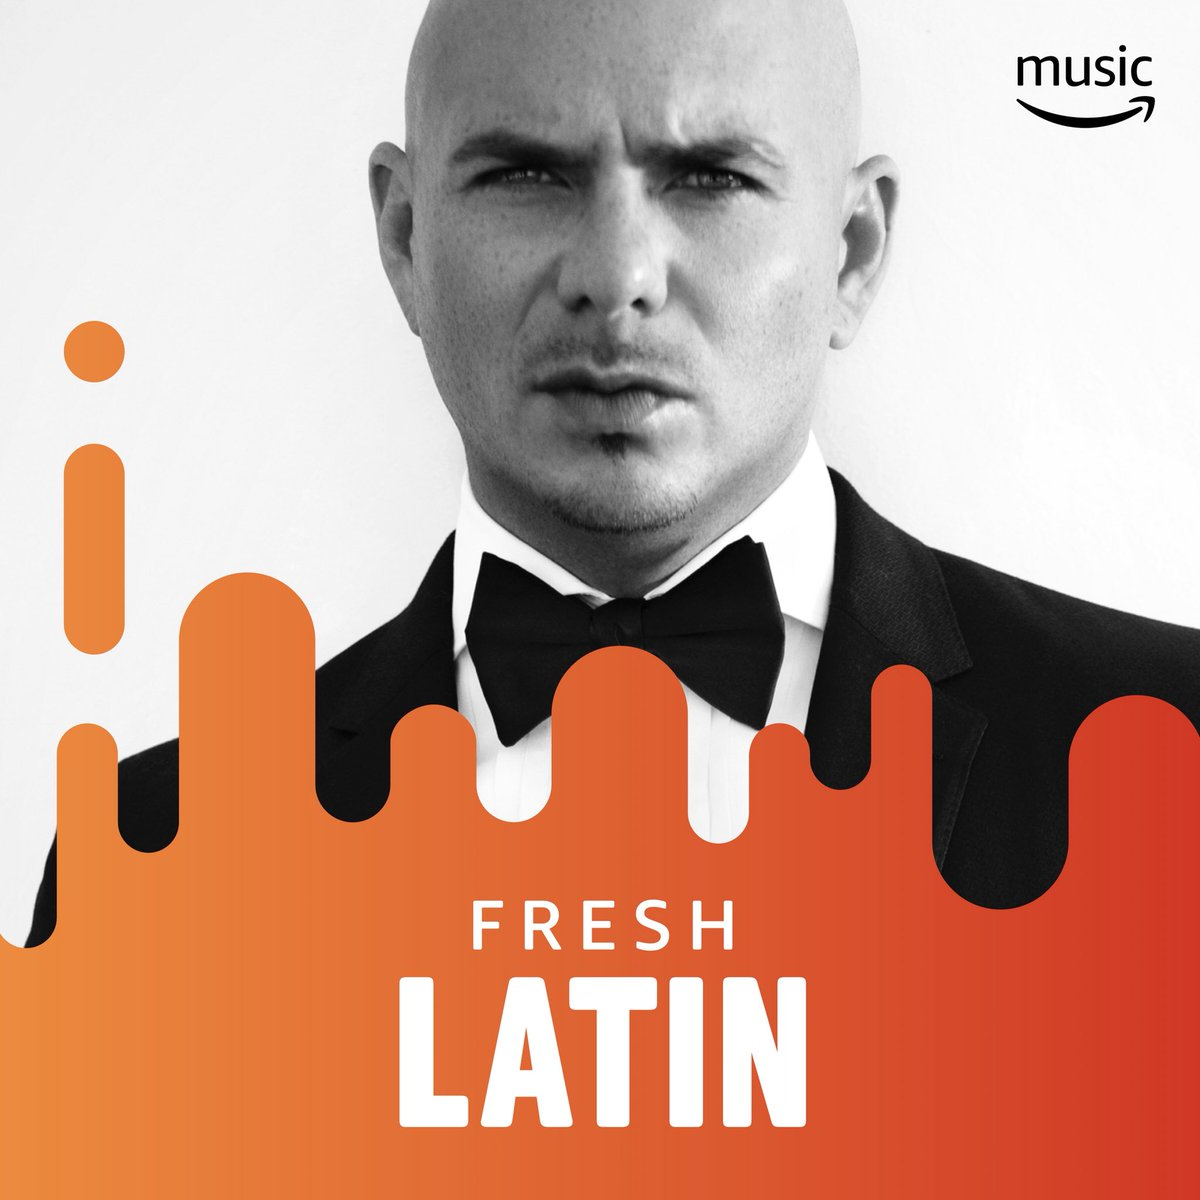 Look whose on @amazonmusic #FreshLatin! ???? Check it out: https://t.co/wToyTXNMce https://t.co/RazzPh8hdK